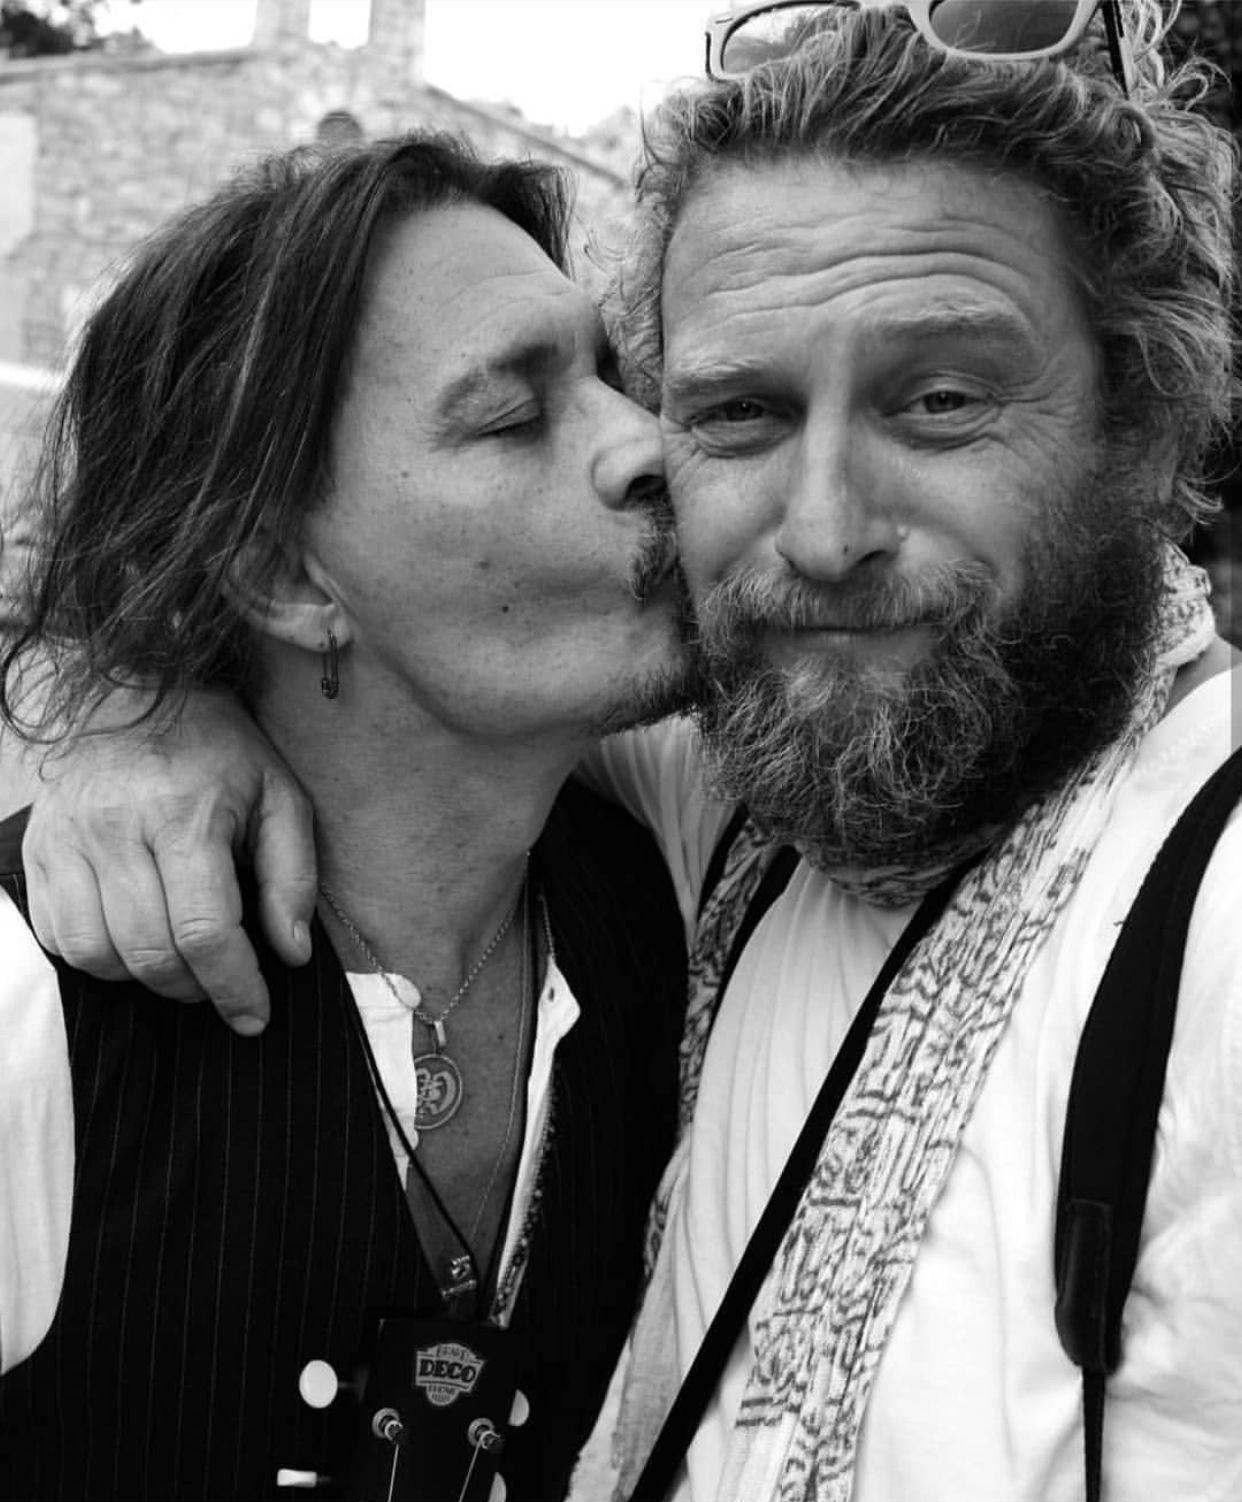 Pin by Rebecca Osborn on Johnny Depp is Love♥️ Johnny